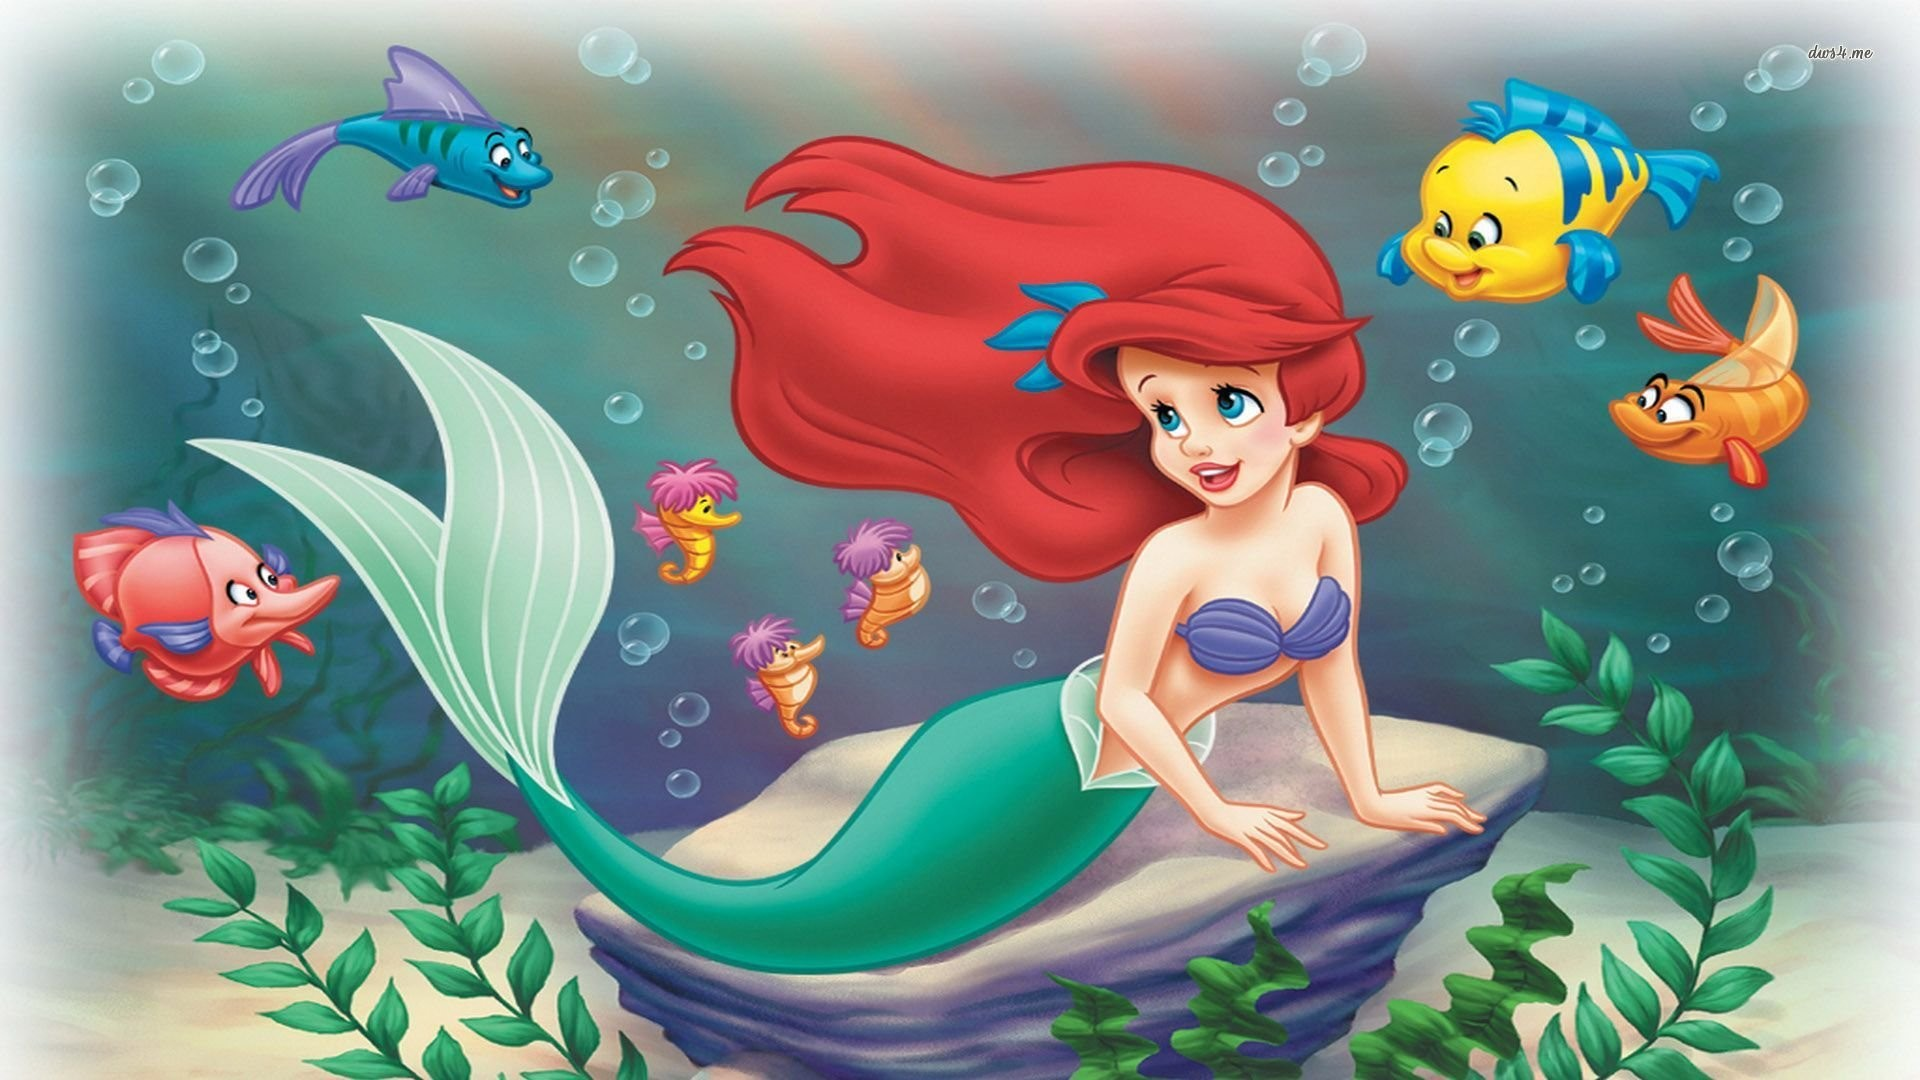 Little Mermaid Wallpaper ·① Download Free Cool HD